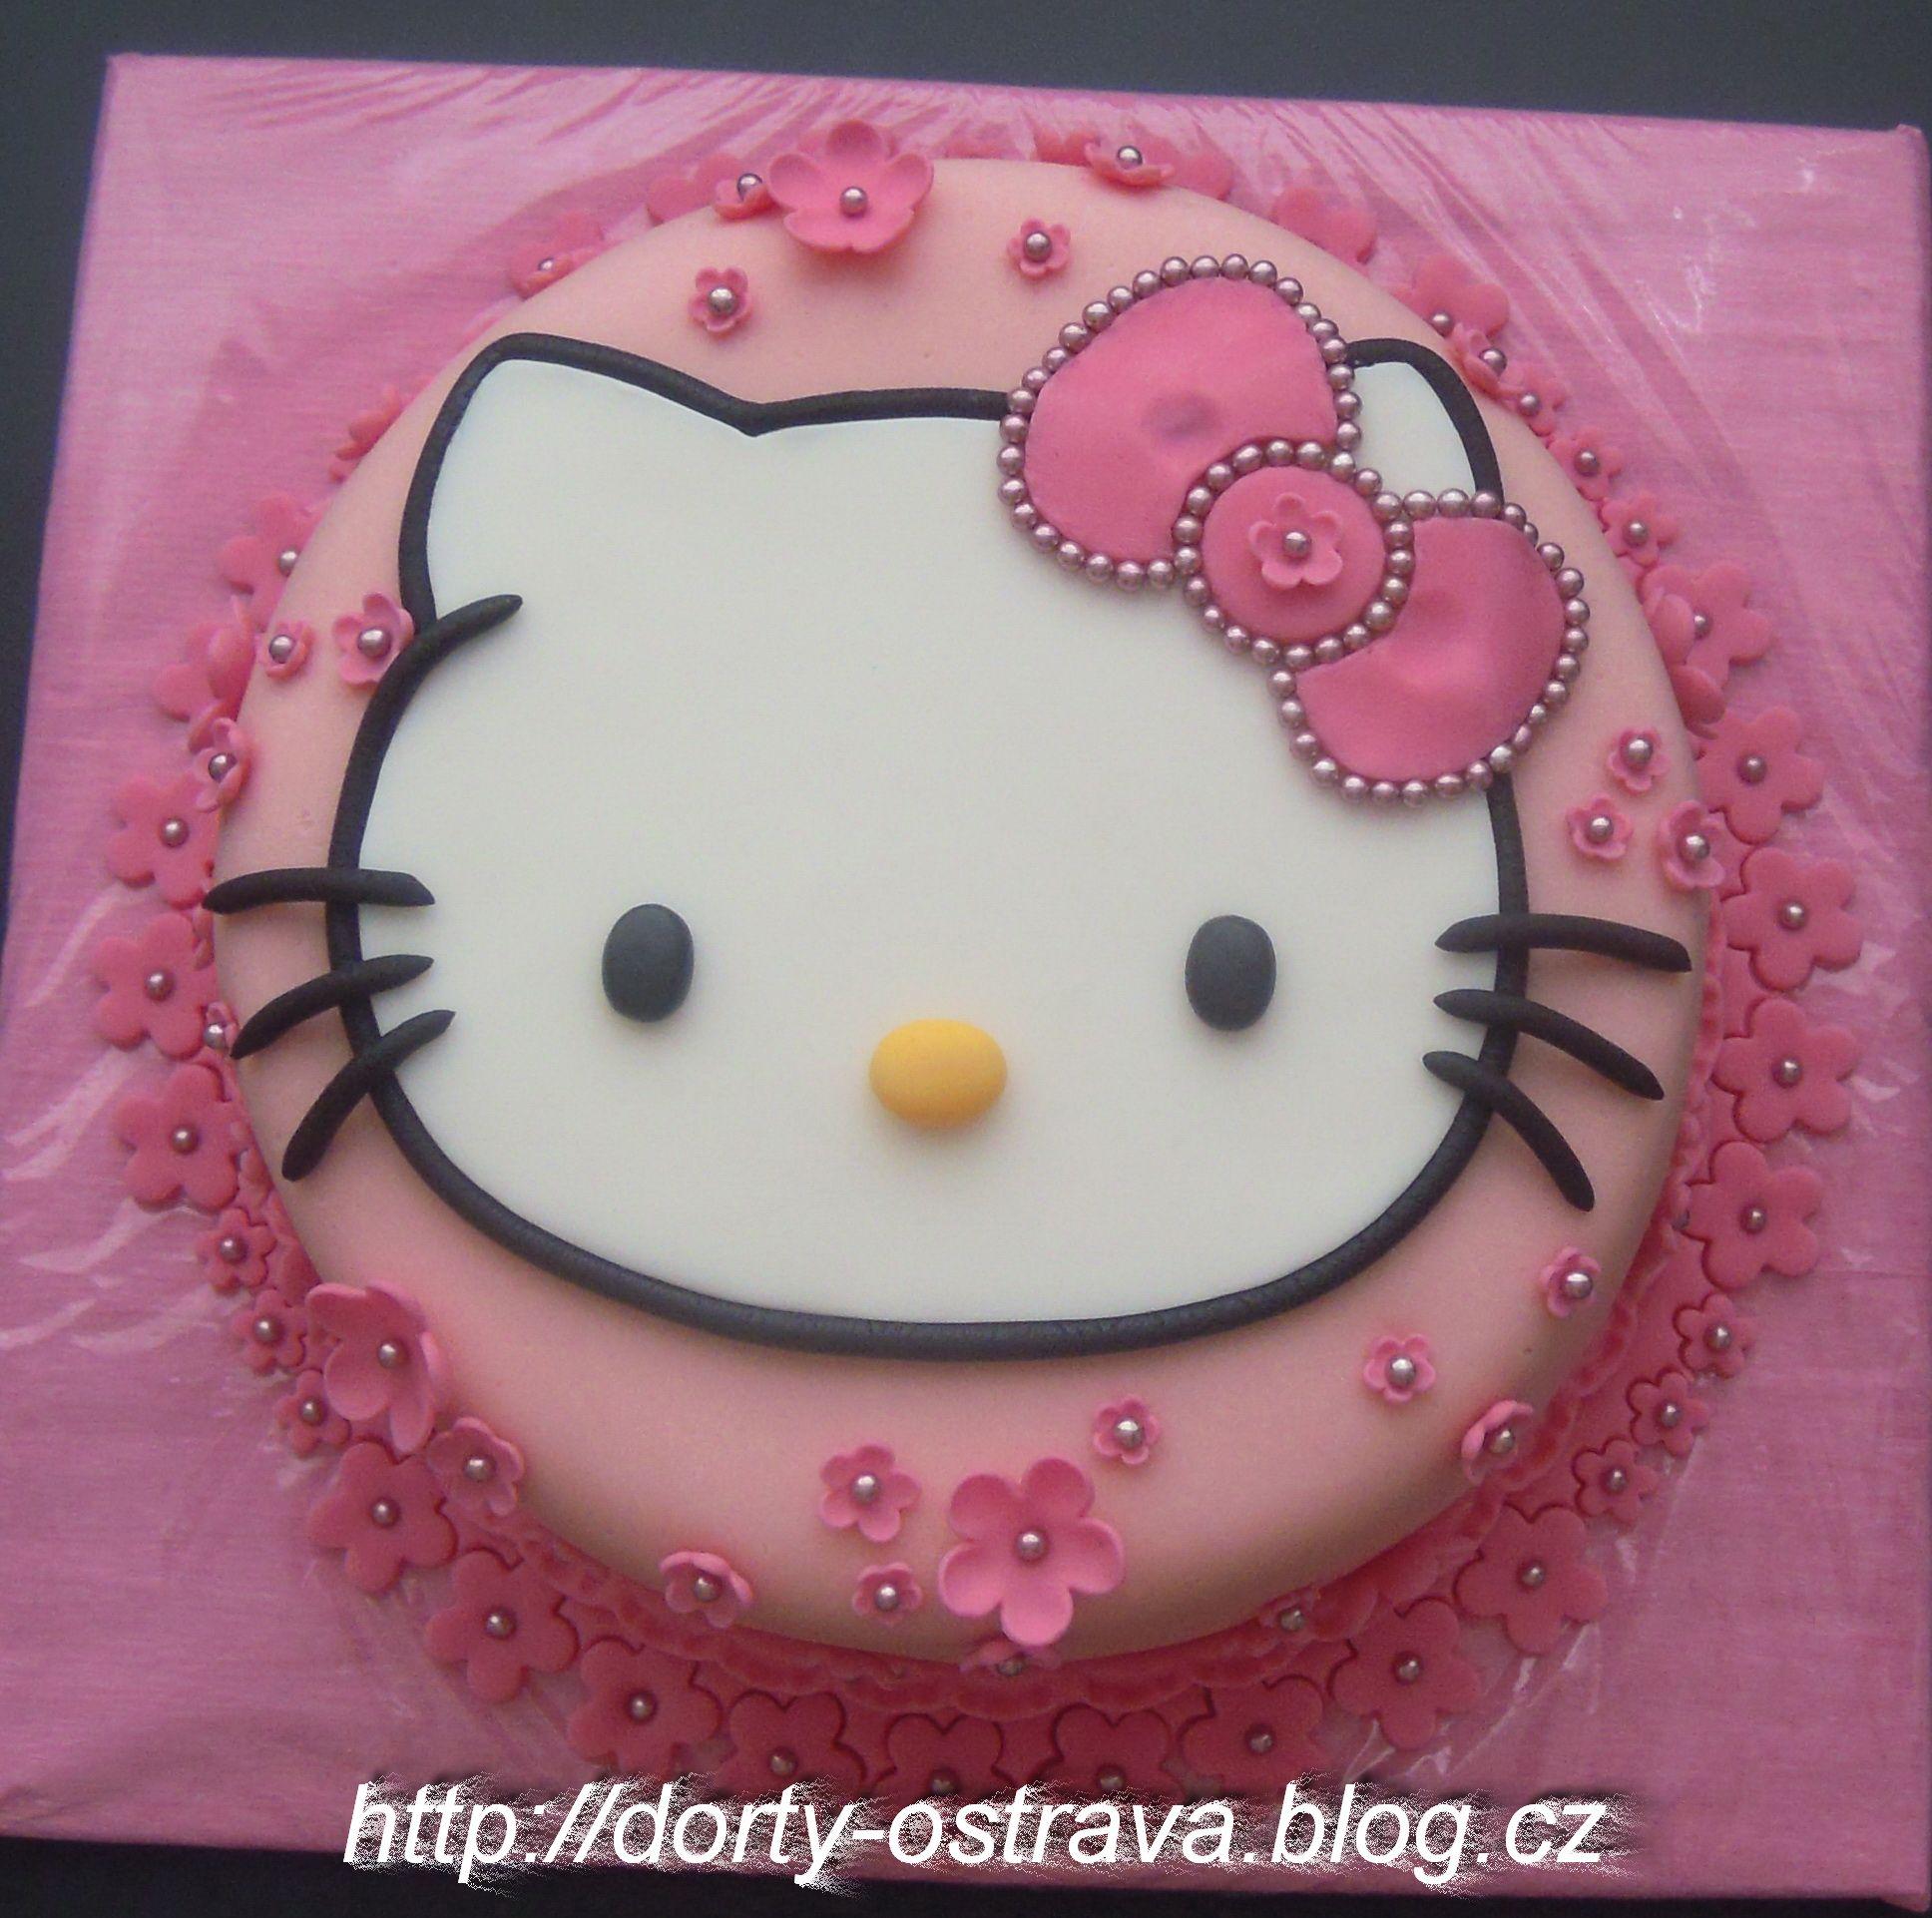 Childrens Birthday Cakes Beautiful Cakes Pinterest